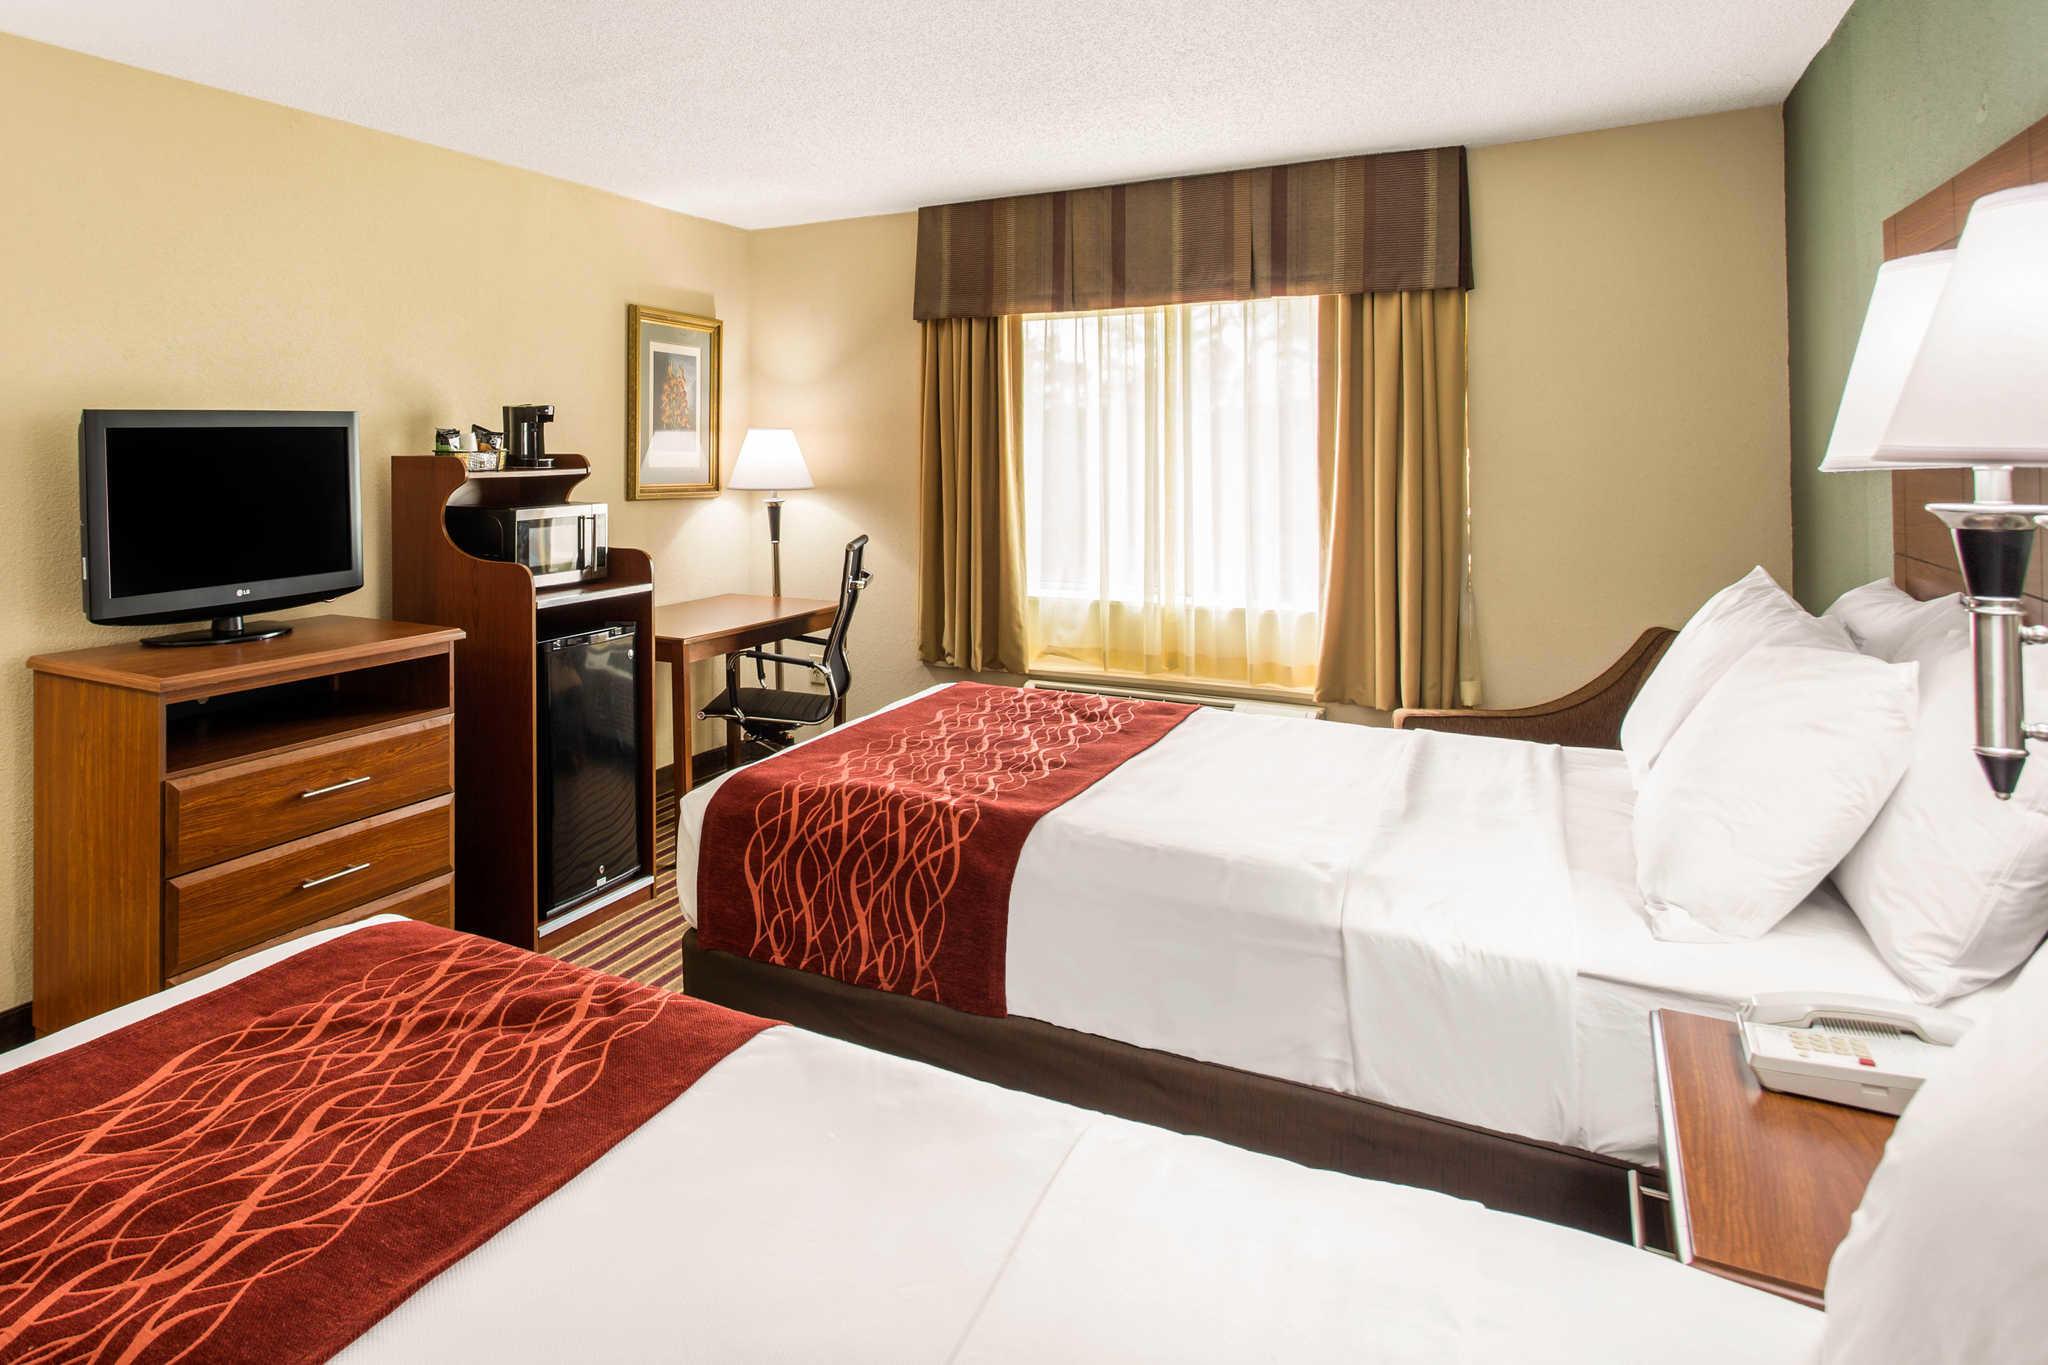 Comfort Inn & Suites Crabtree Valley image 5